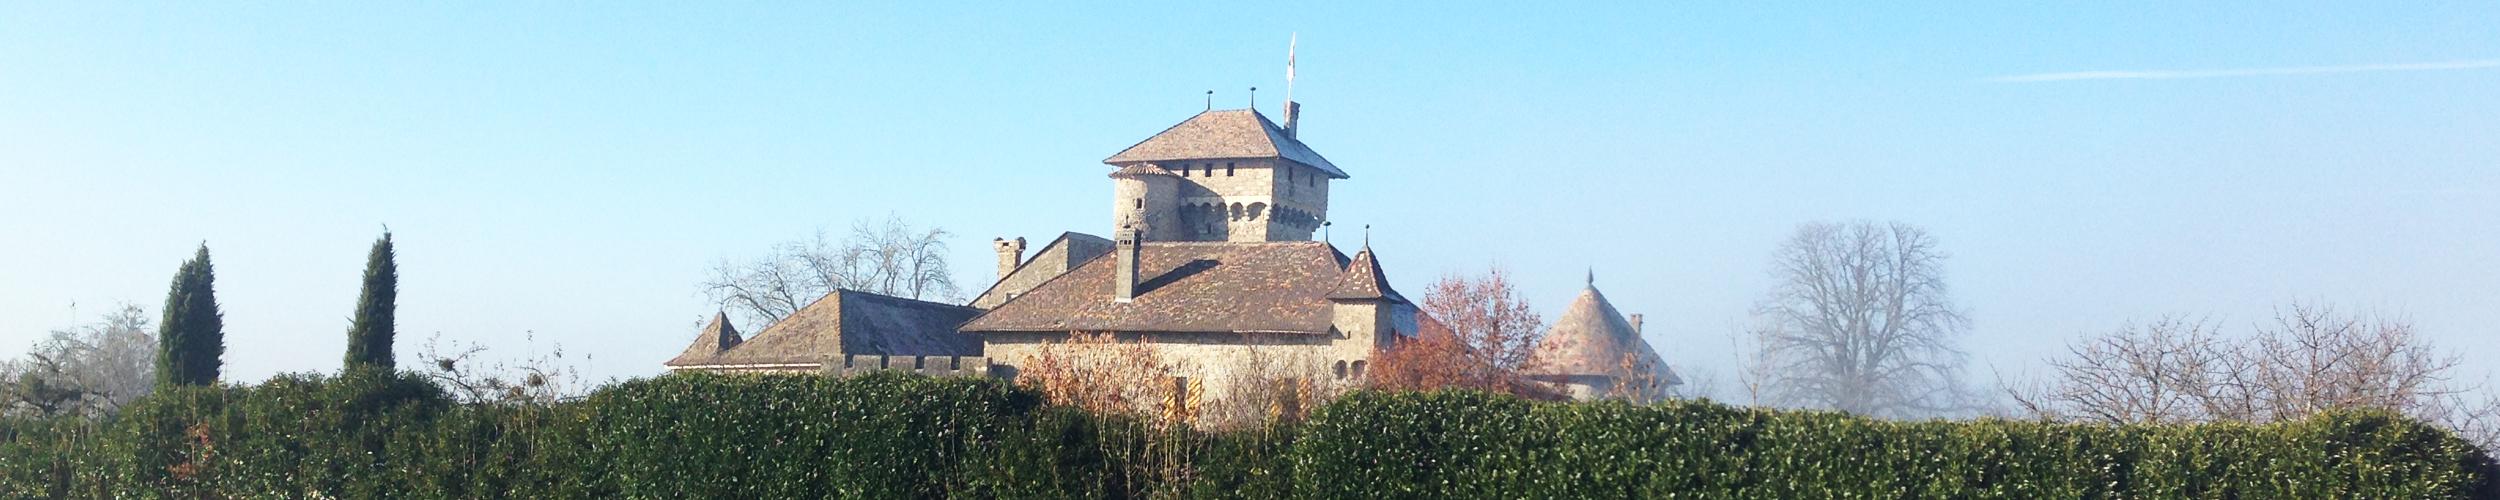 Château d'Avully, Brenthonne